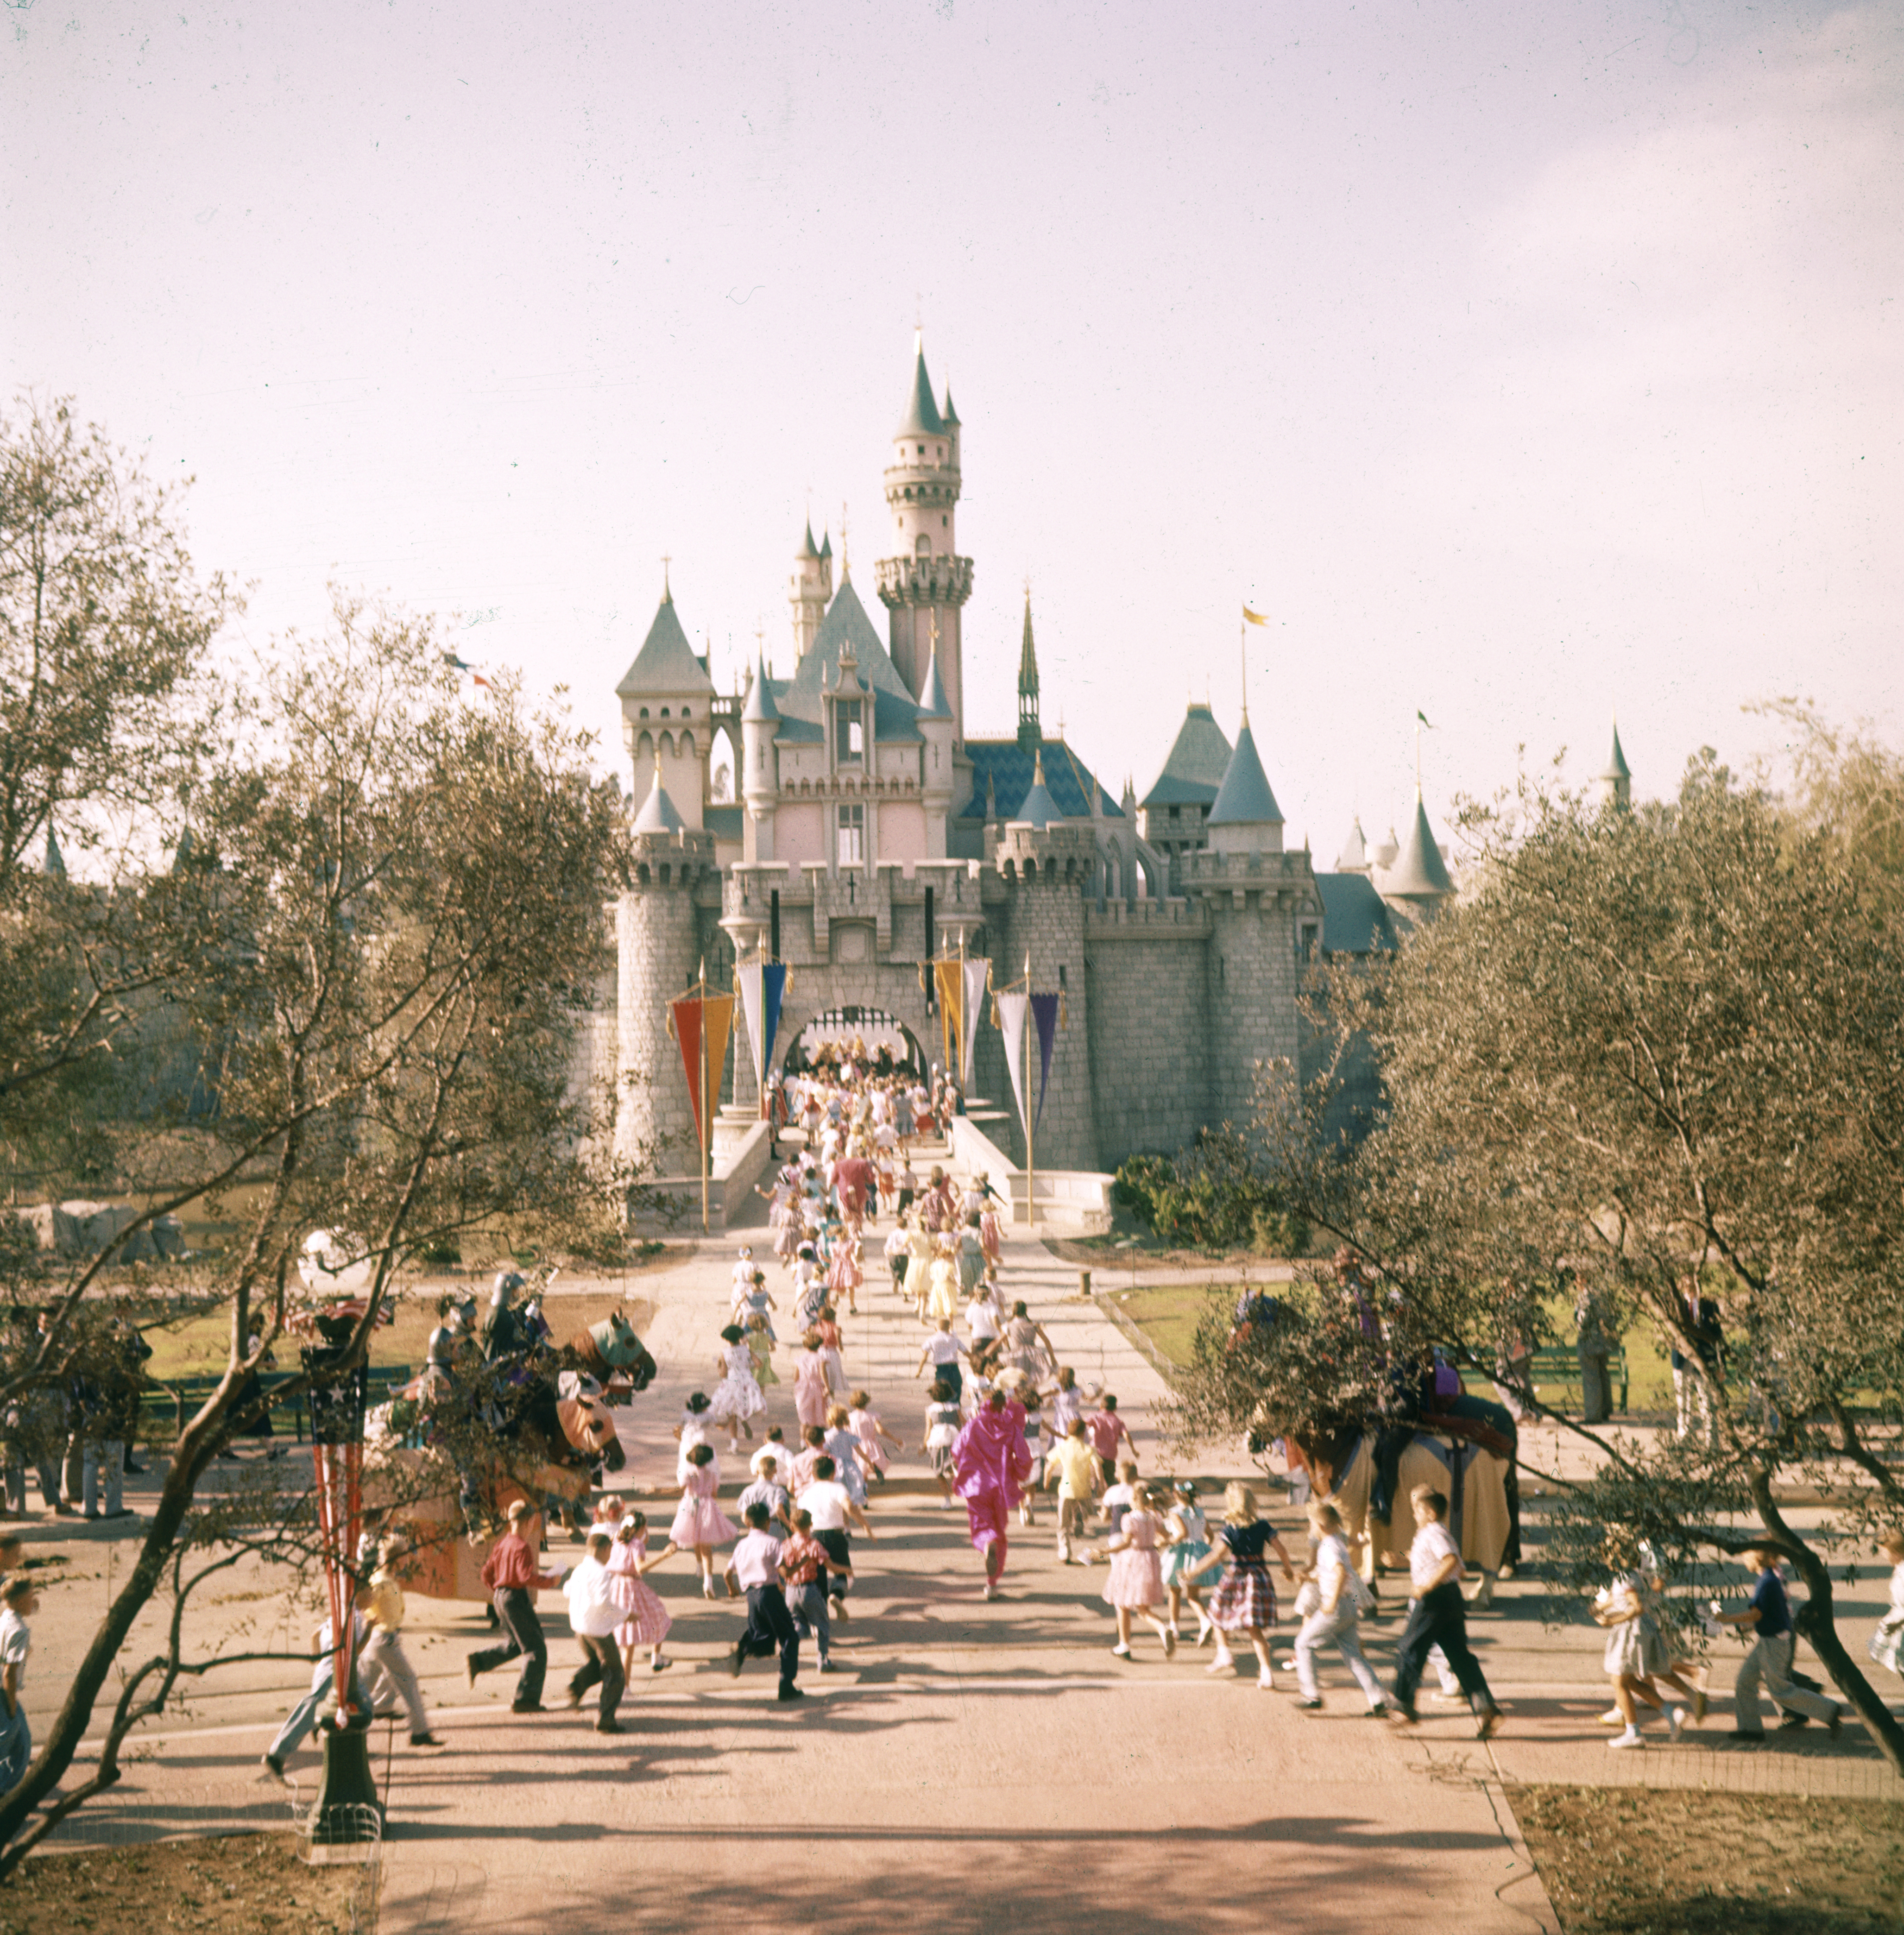 Subject: People running to Disneyland castle at Disneyland Amusement Park. Anaheim, California 1955Photographer- Loomis DeanTime Inc OwnedMerlin- 1201478